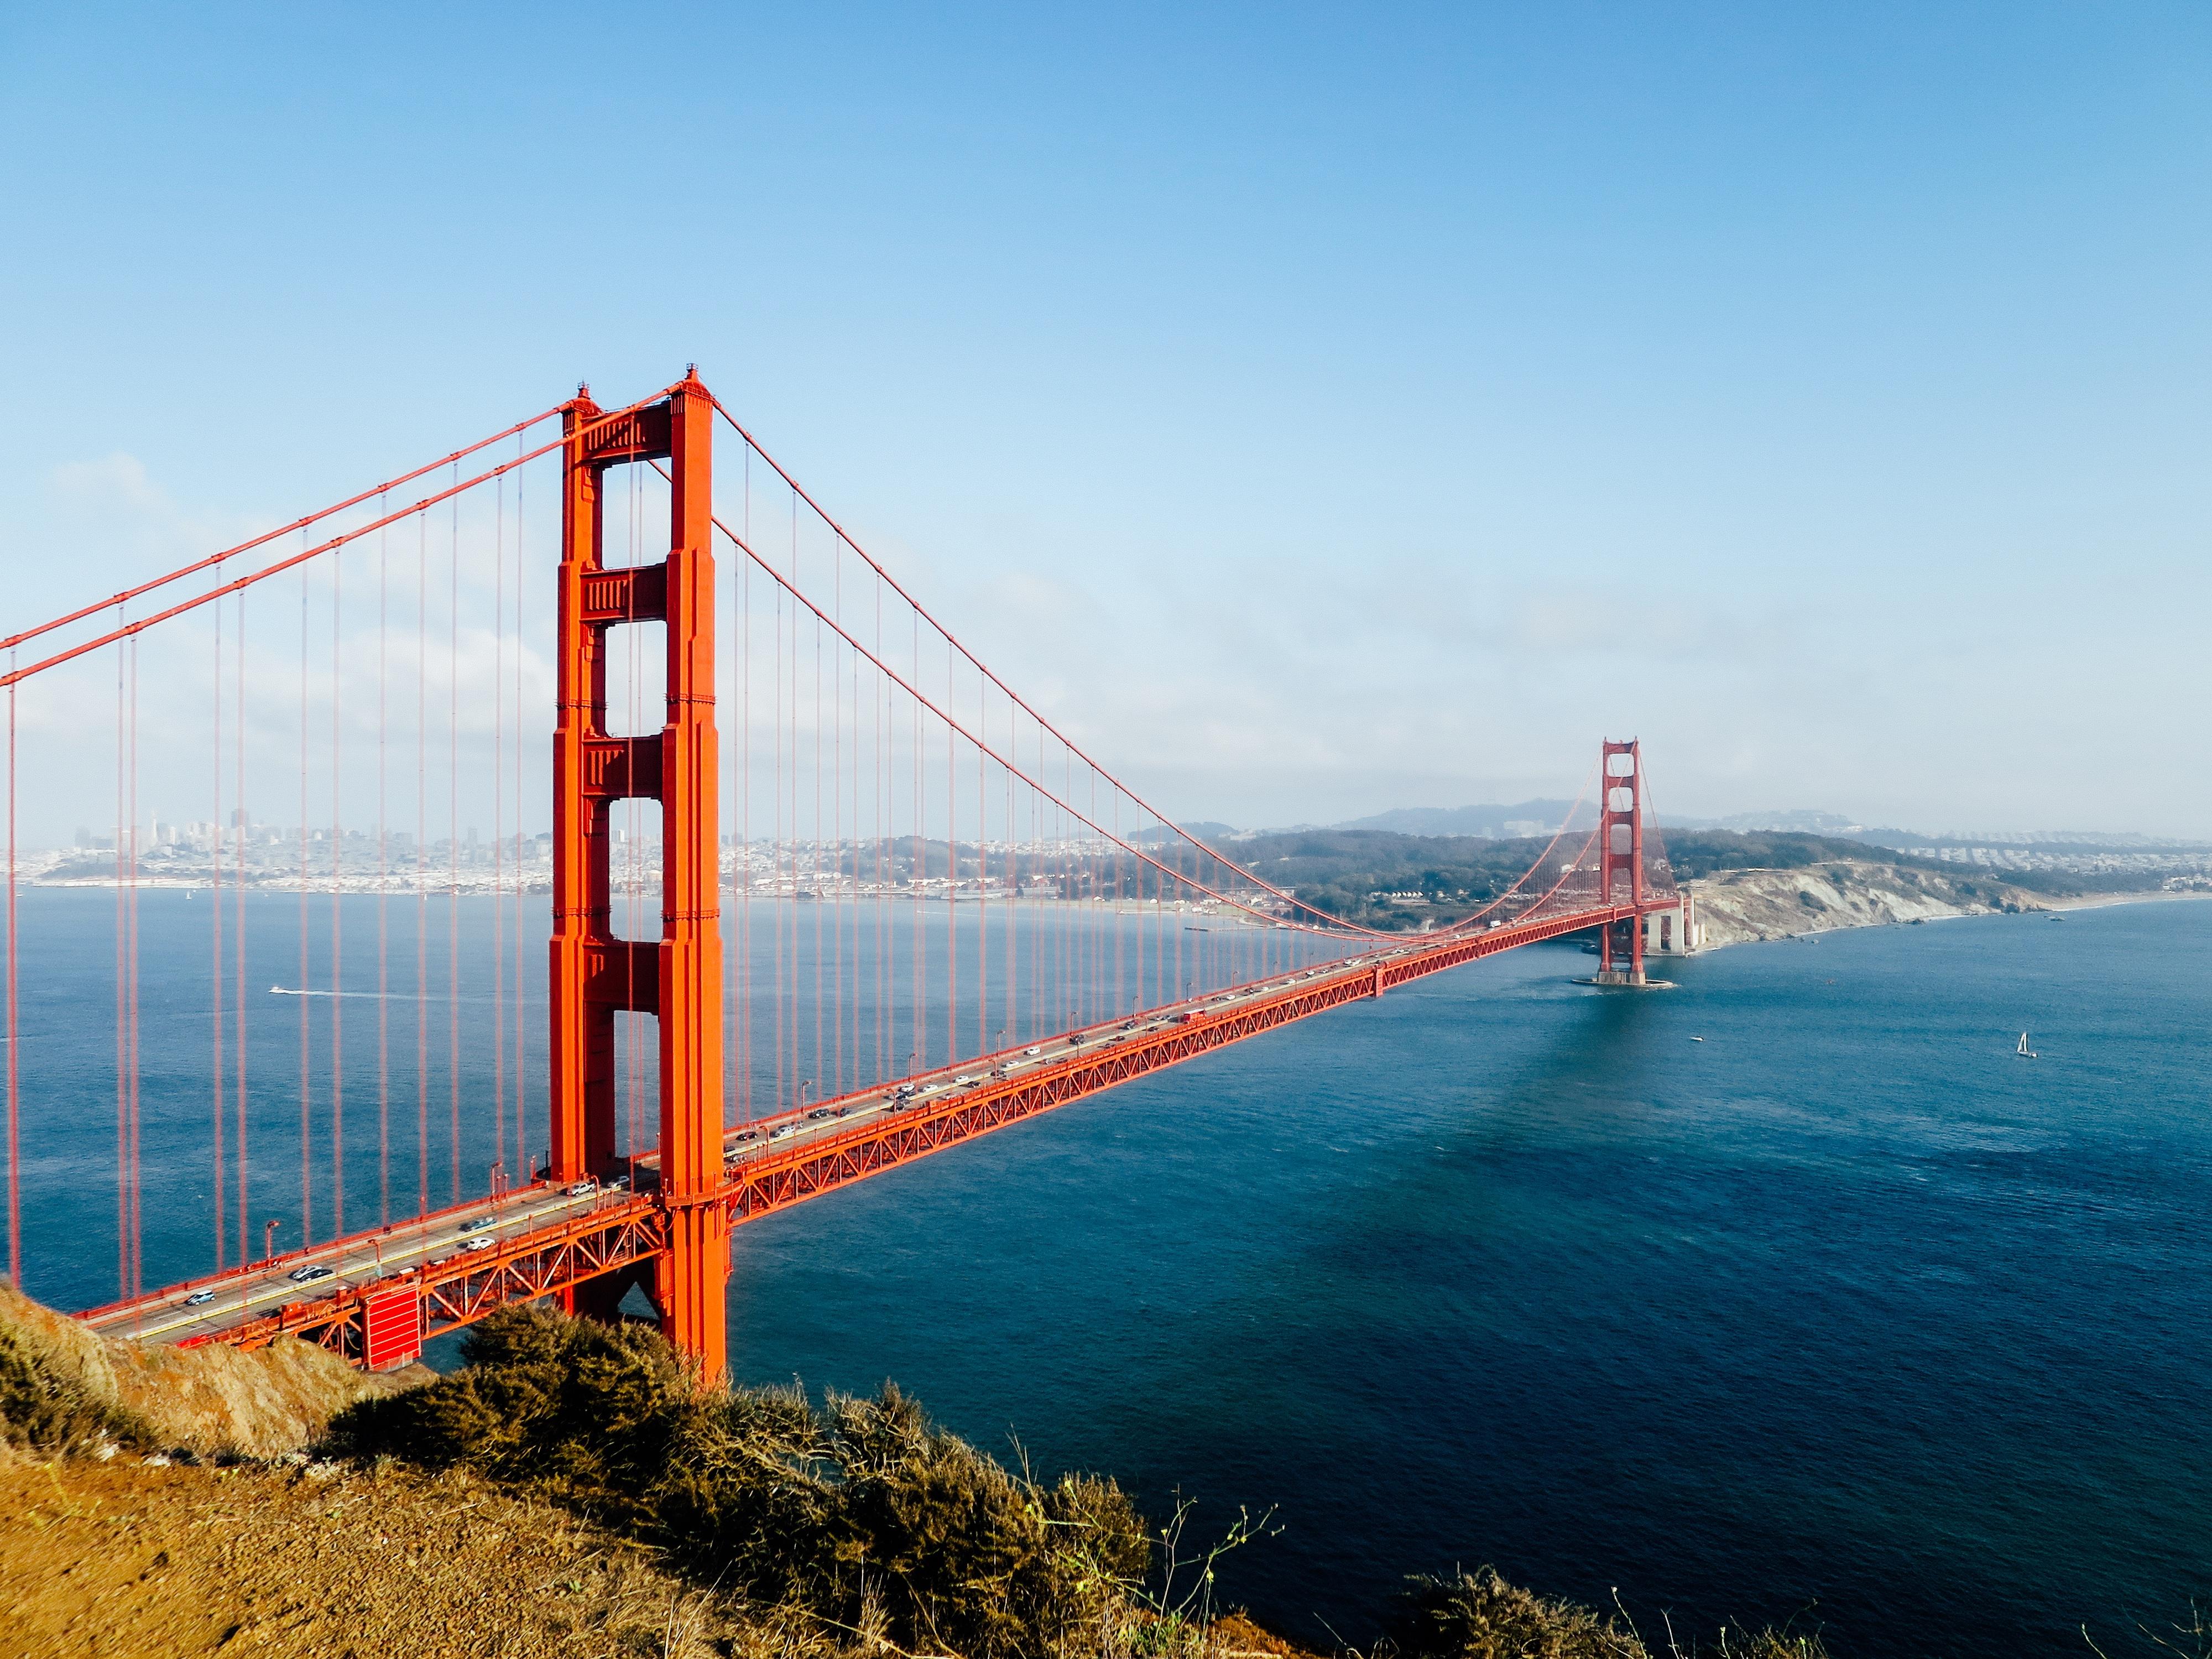 тесто мост в лос анджелесе фото если вас